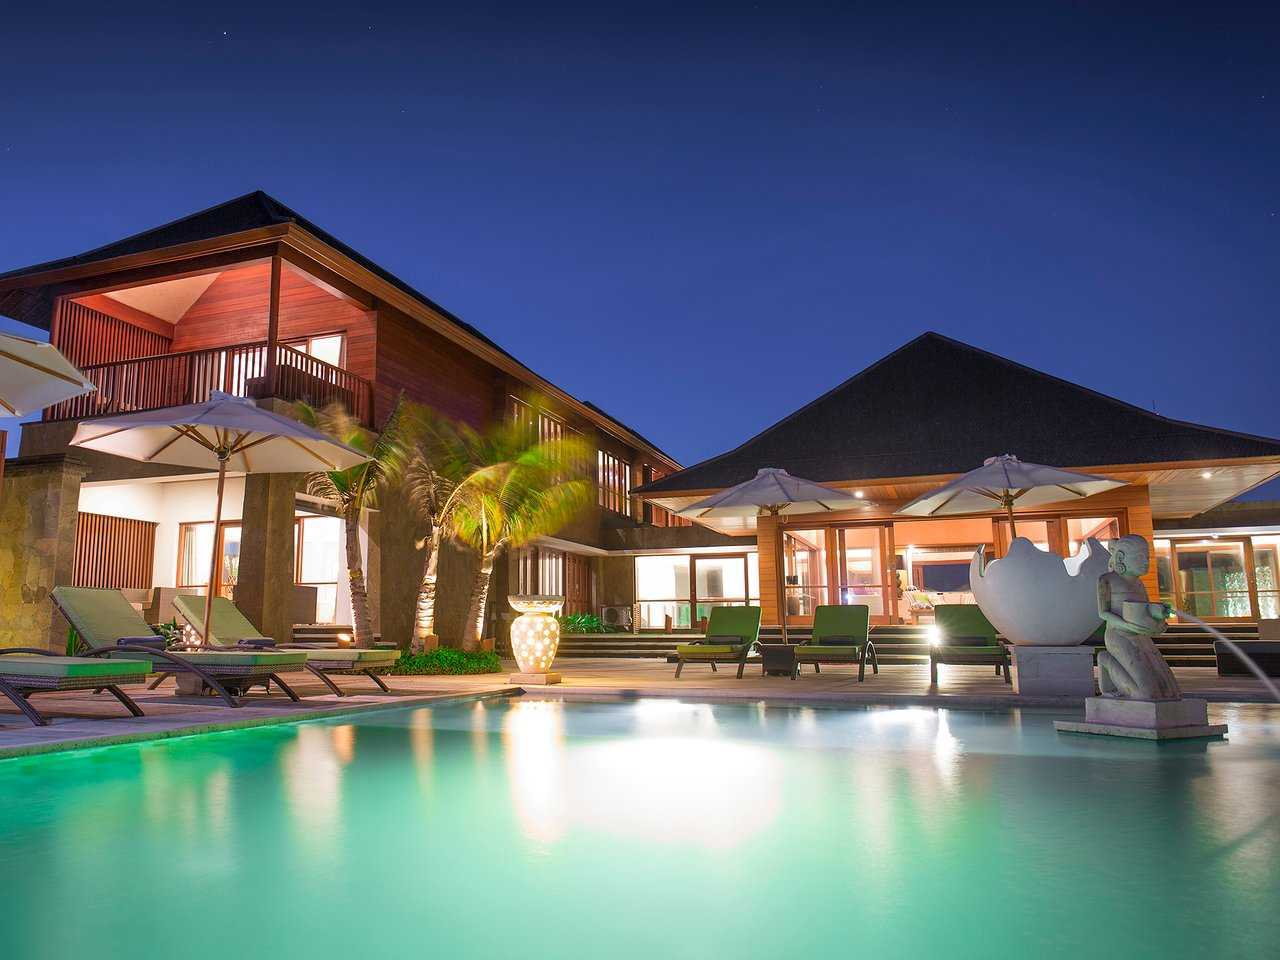 Agung Budi Raharsa | Architecture & Engineering Bayu Gita Villa - Bali Bali, Indonesia Bali, Indonesia Pool Area Contemporary 88344